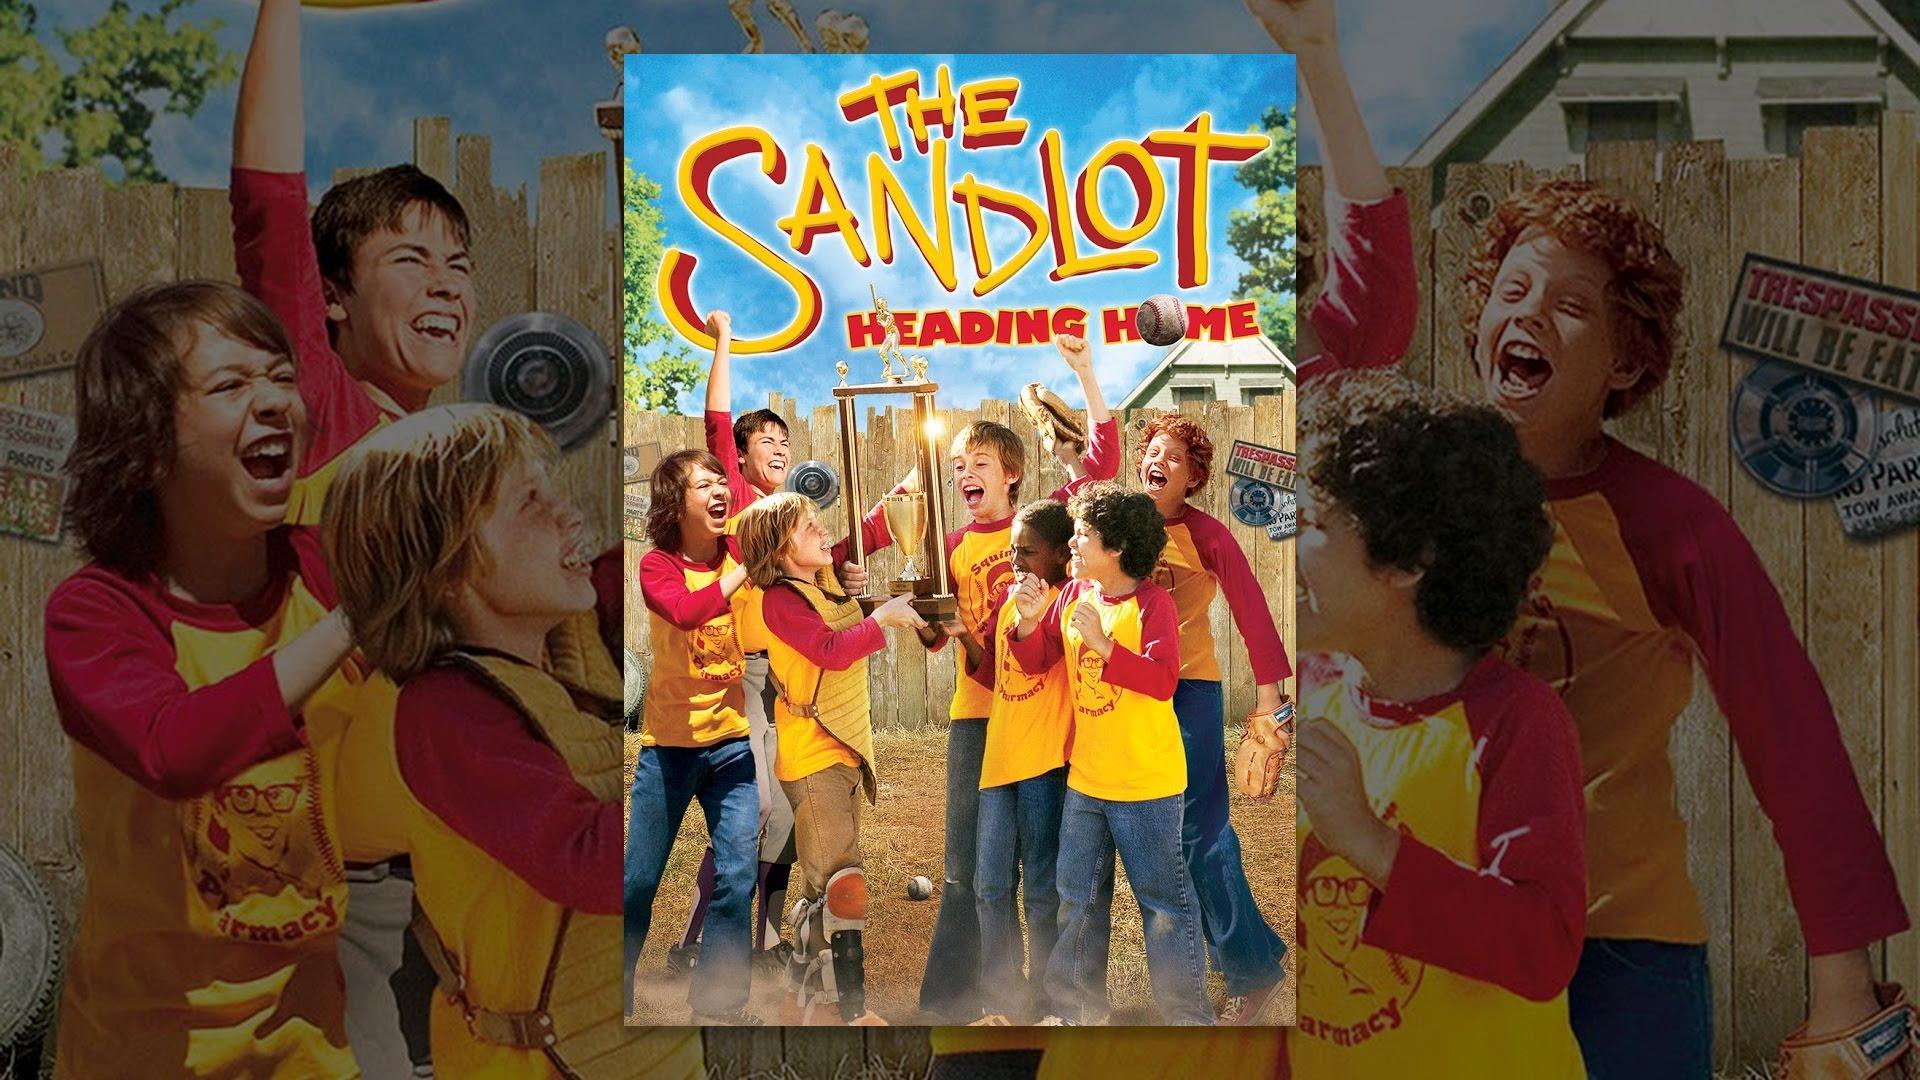 The Sandlot Heading Home Aka Sandlot 3